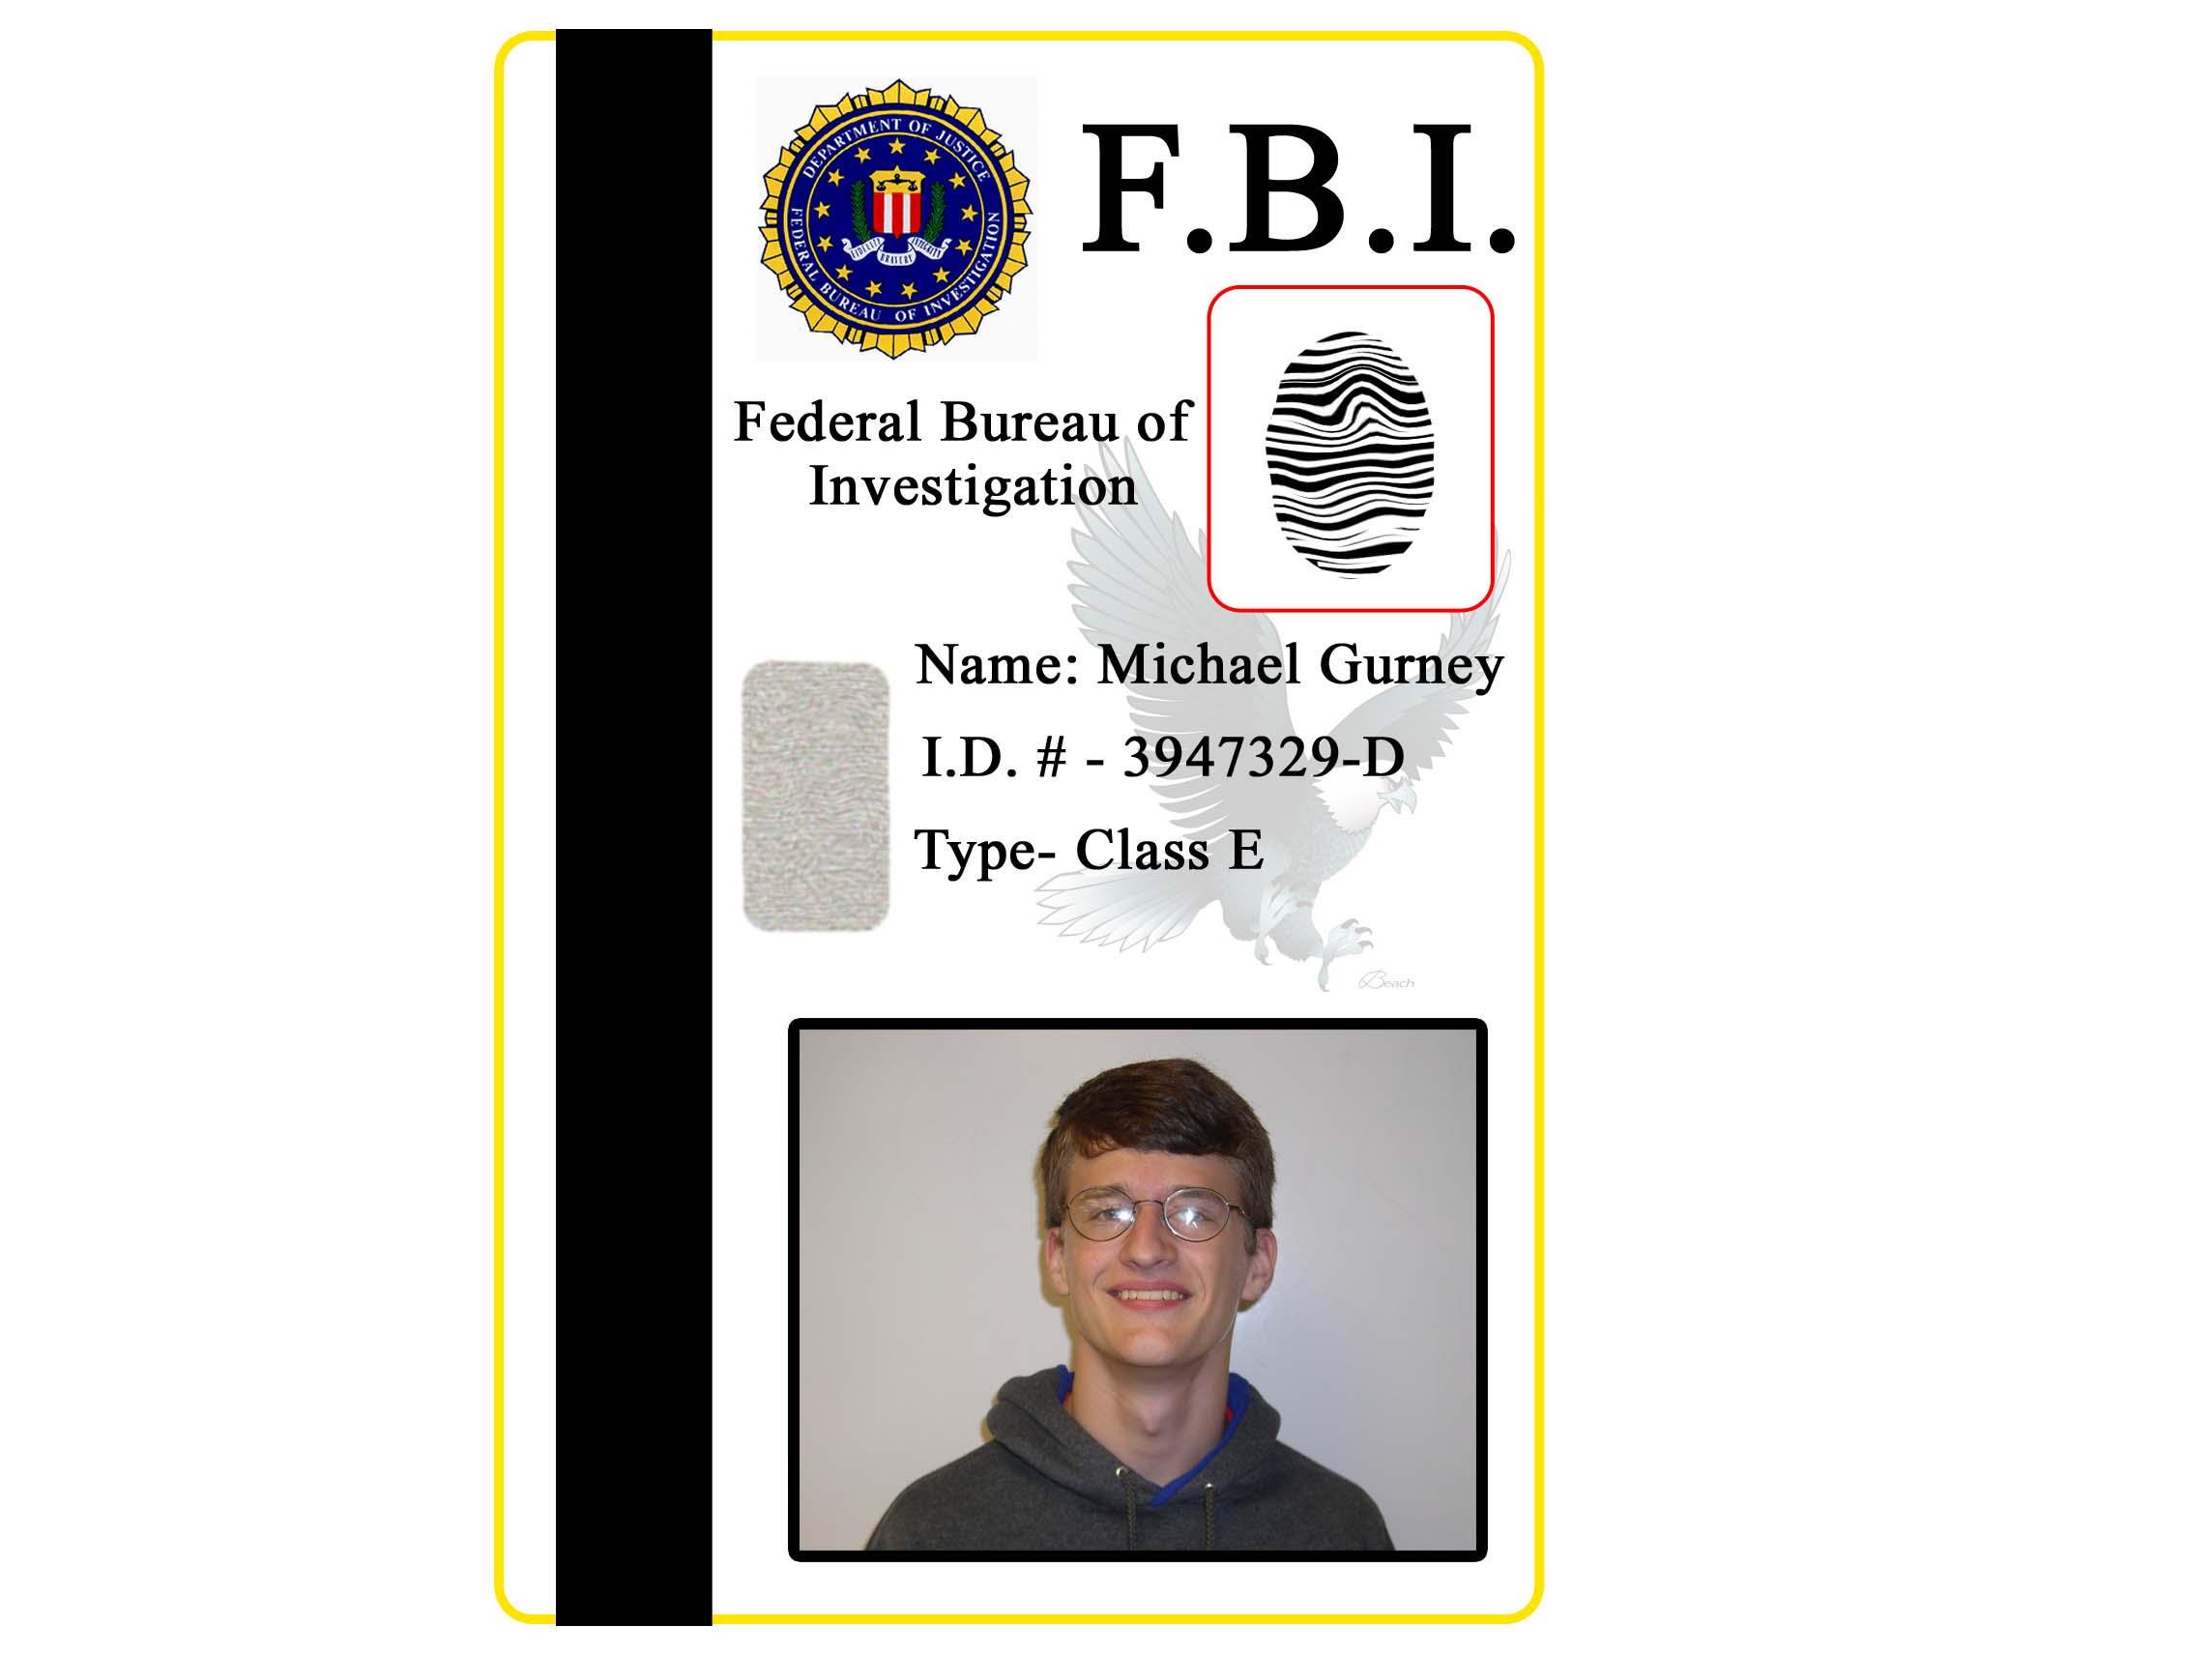 Fbi id badge by trekguy on deviantart - Fbi badge wallpaper ...